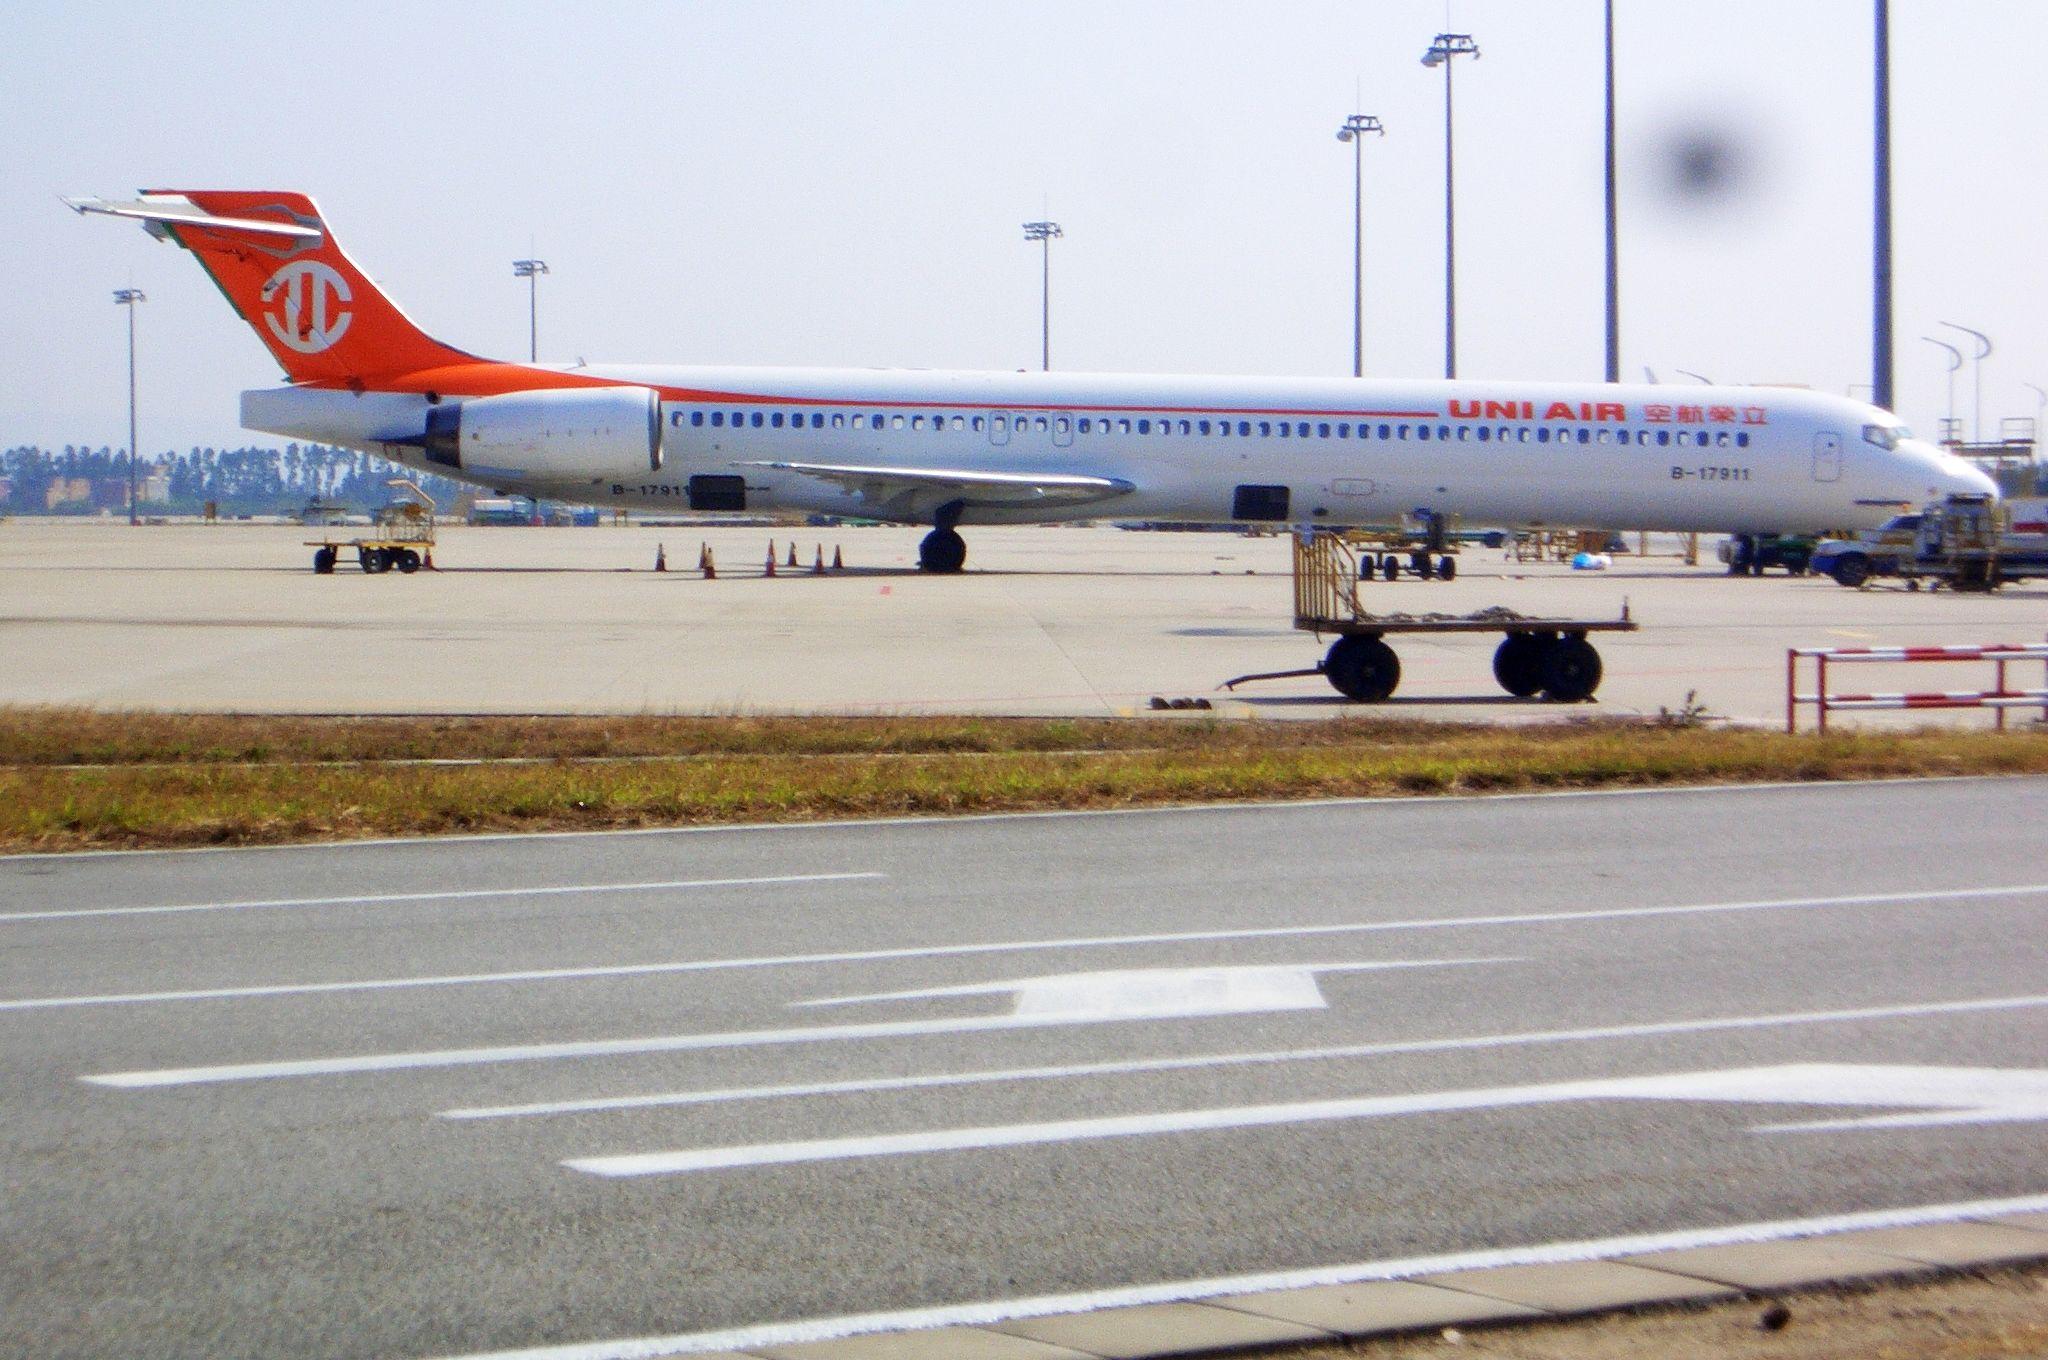 Re:[原创]恢复信心后的第一次发帖,09年第一次活动 MCDONNELL DOUGLAS MD-90 B-17911 中国广州白云机场